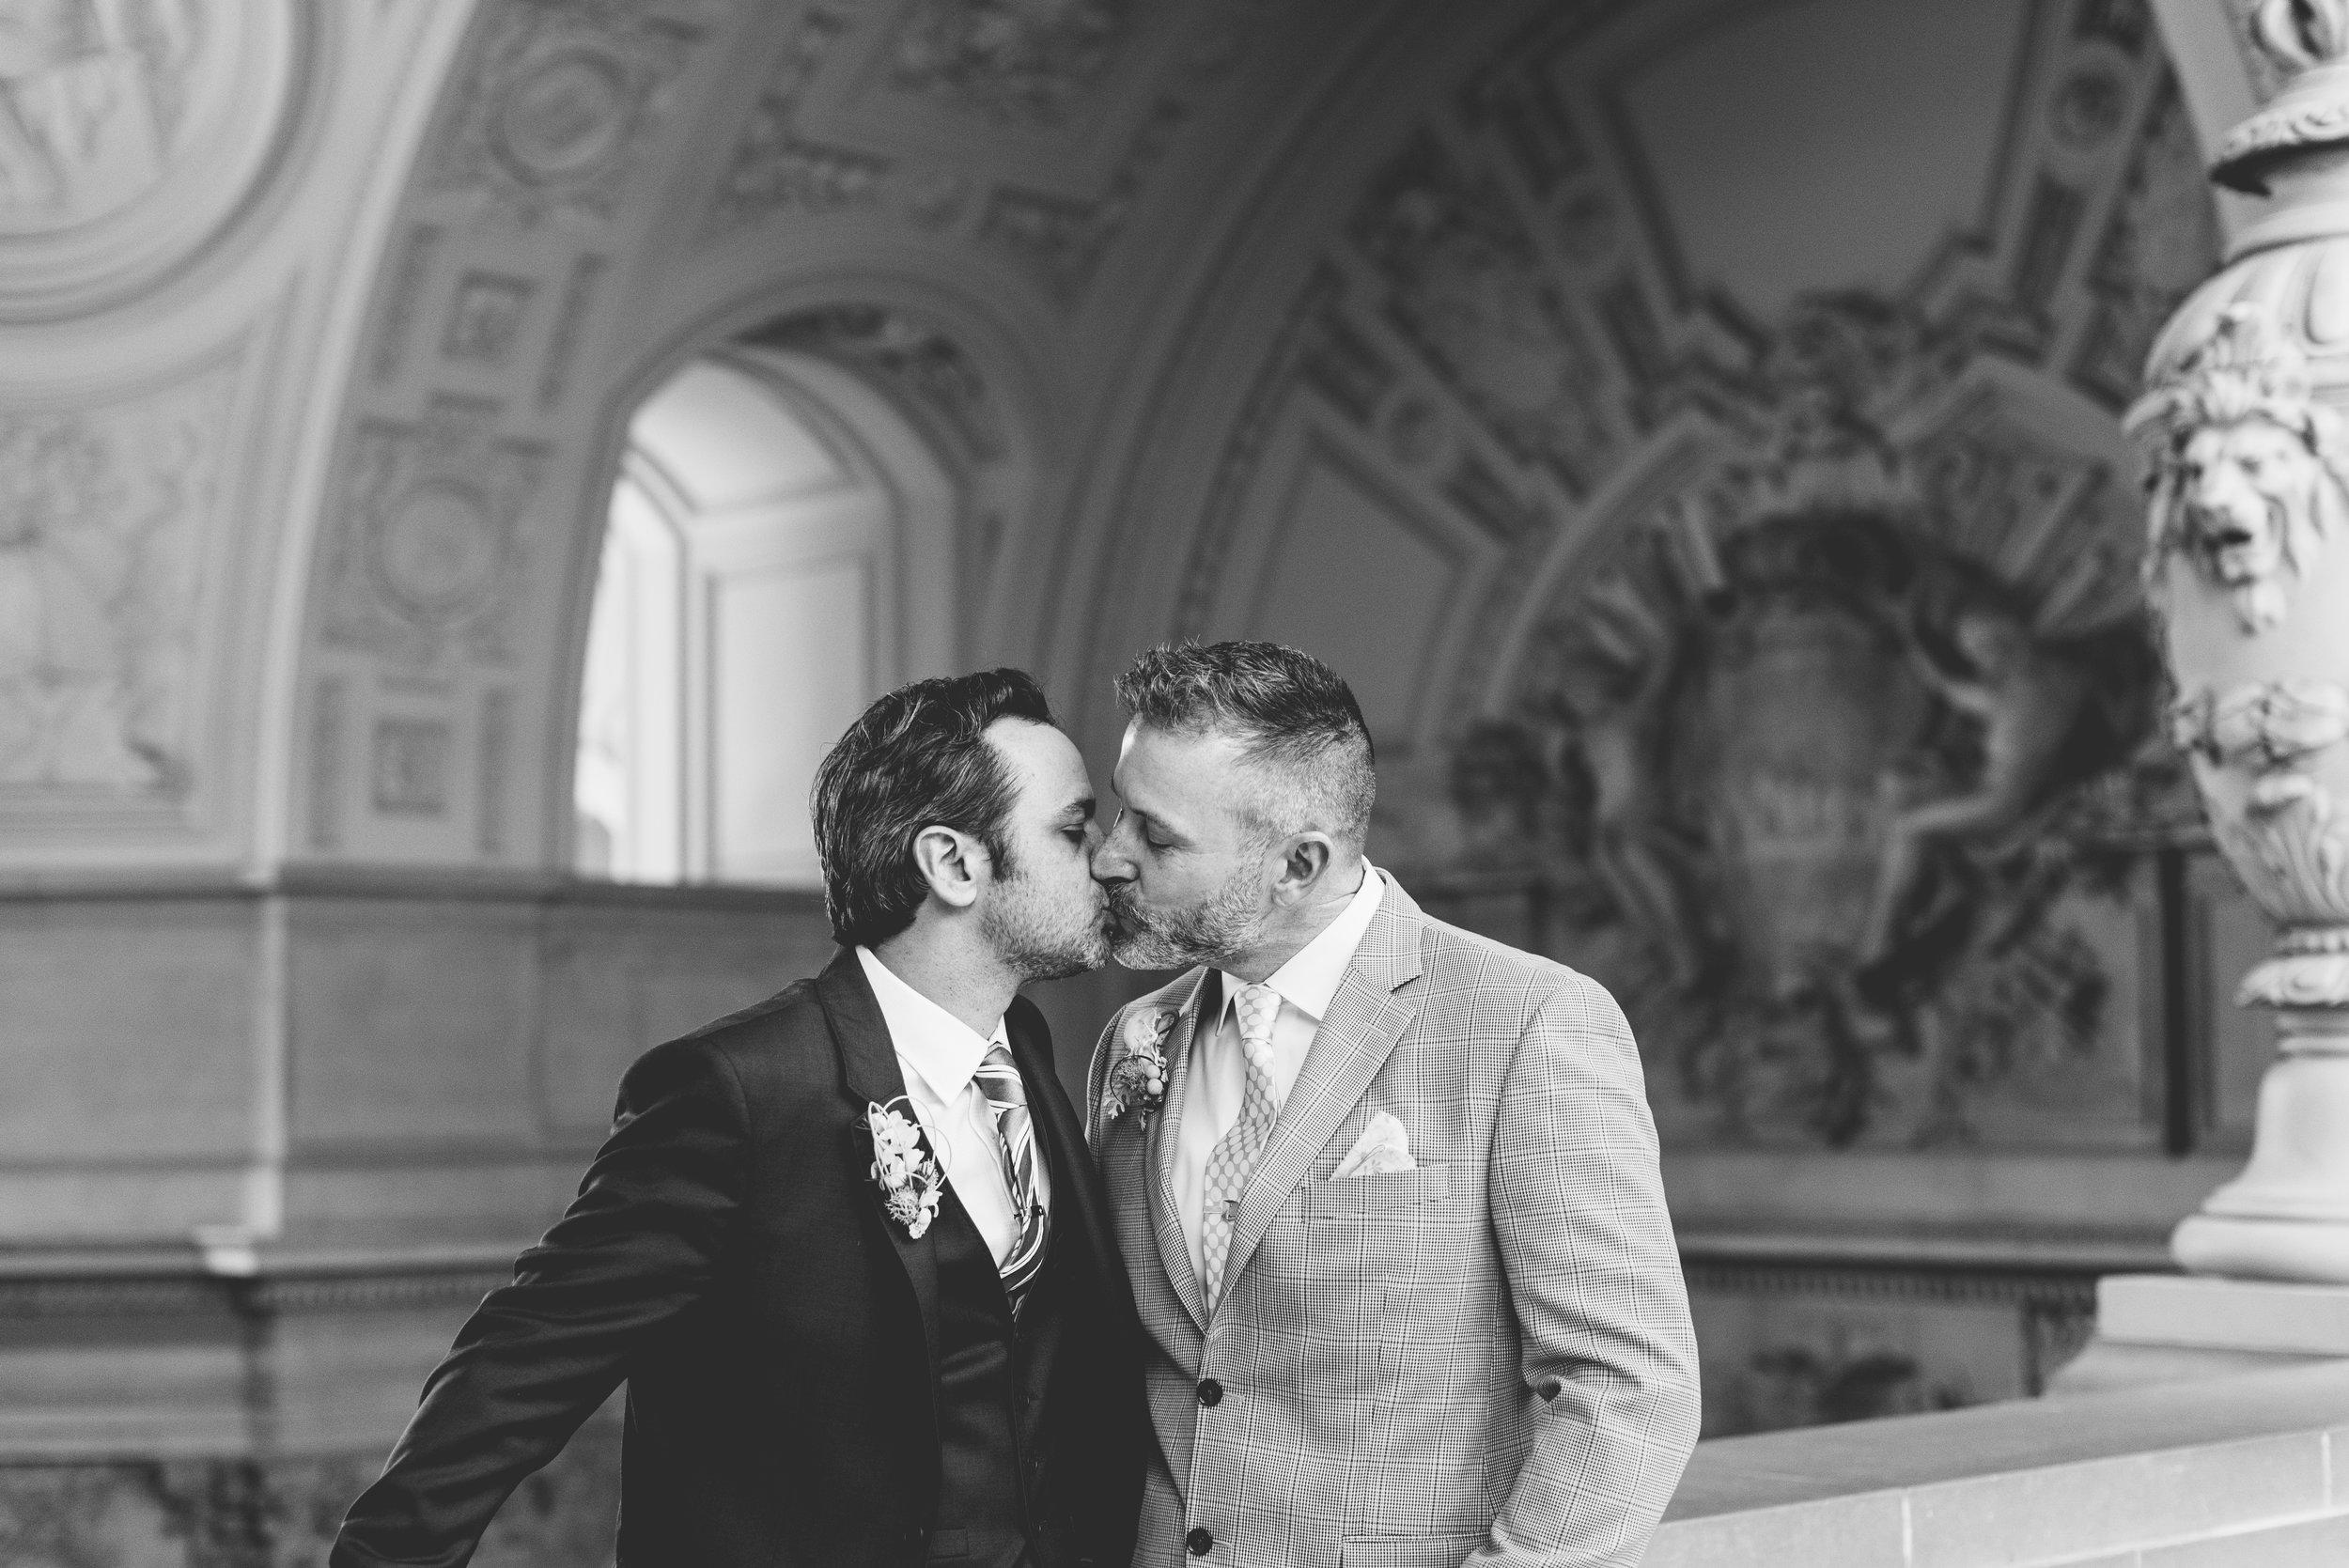 luke-and-brian-city-hall-wedding-18.jpg